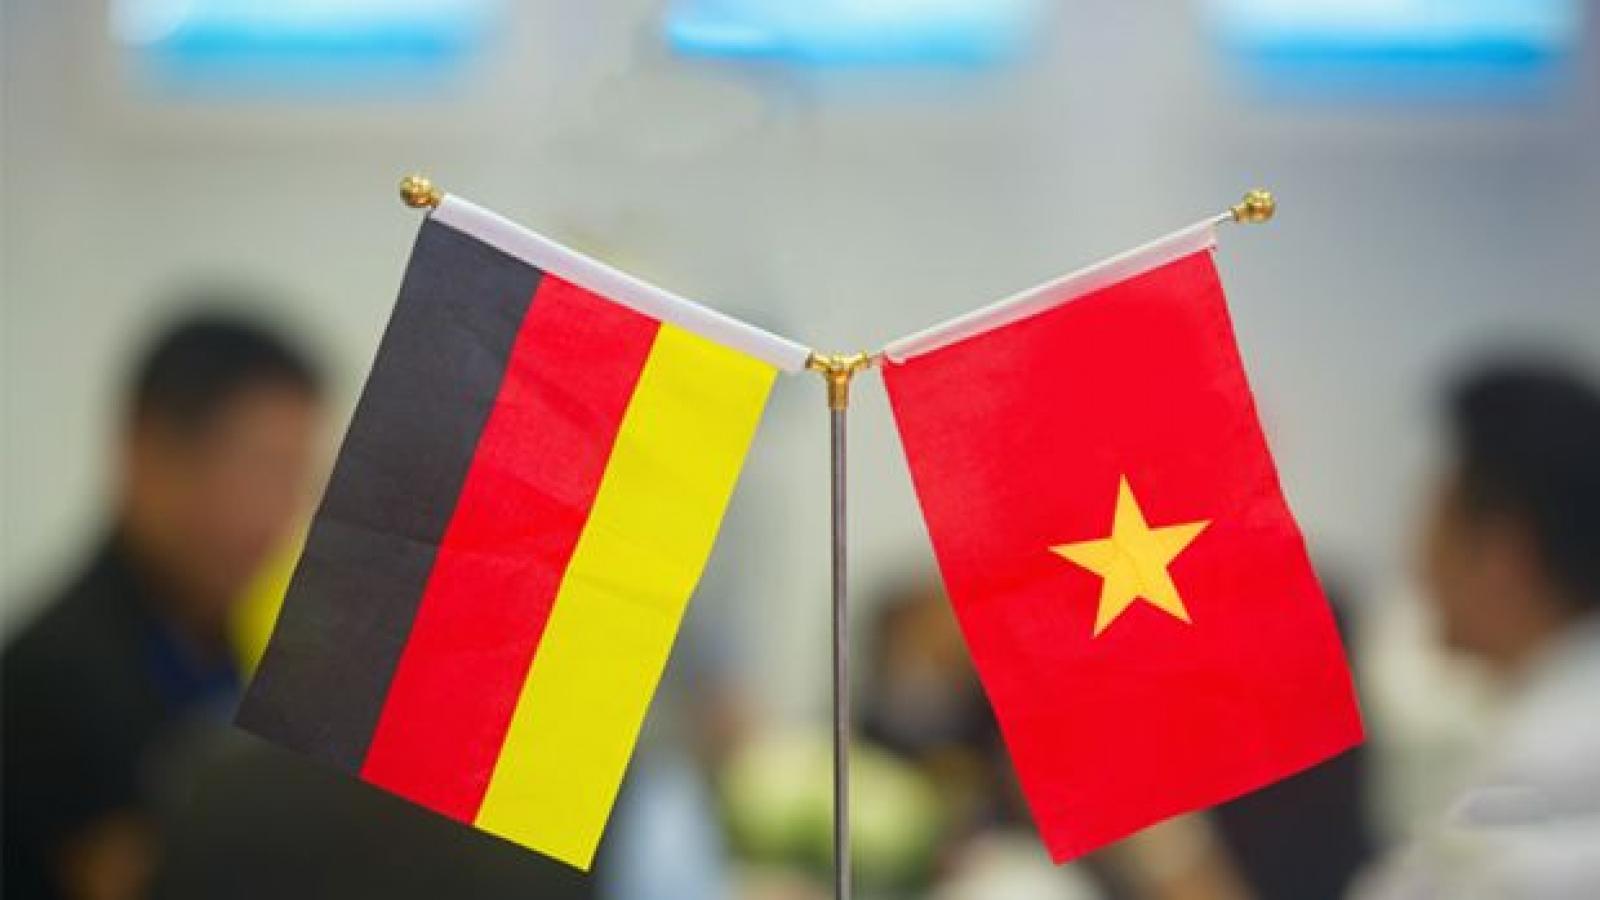 Vietnam, Germany enjoy growing ties in multiple fields despite COVID-19